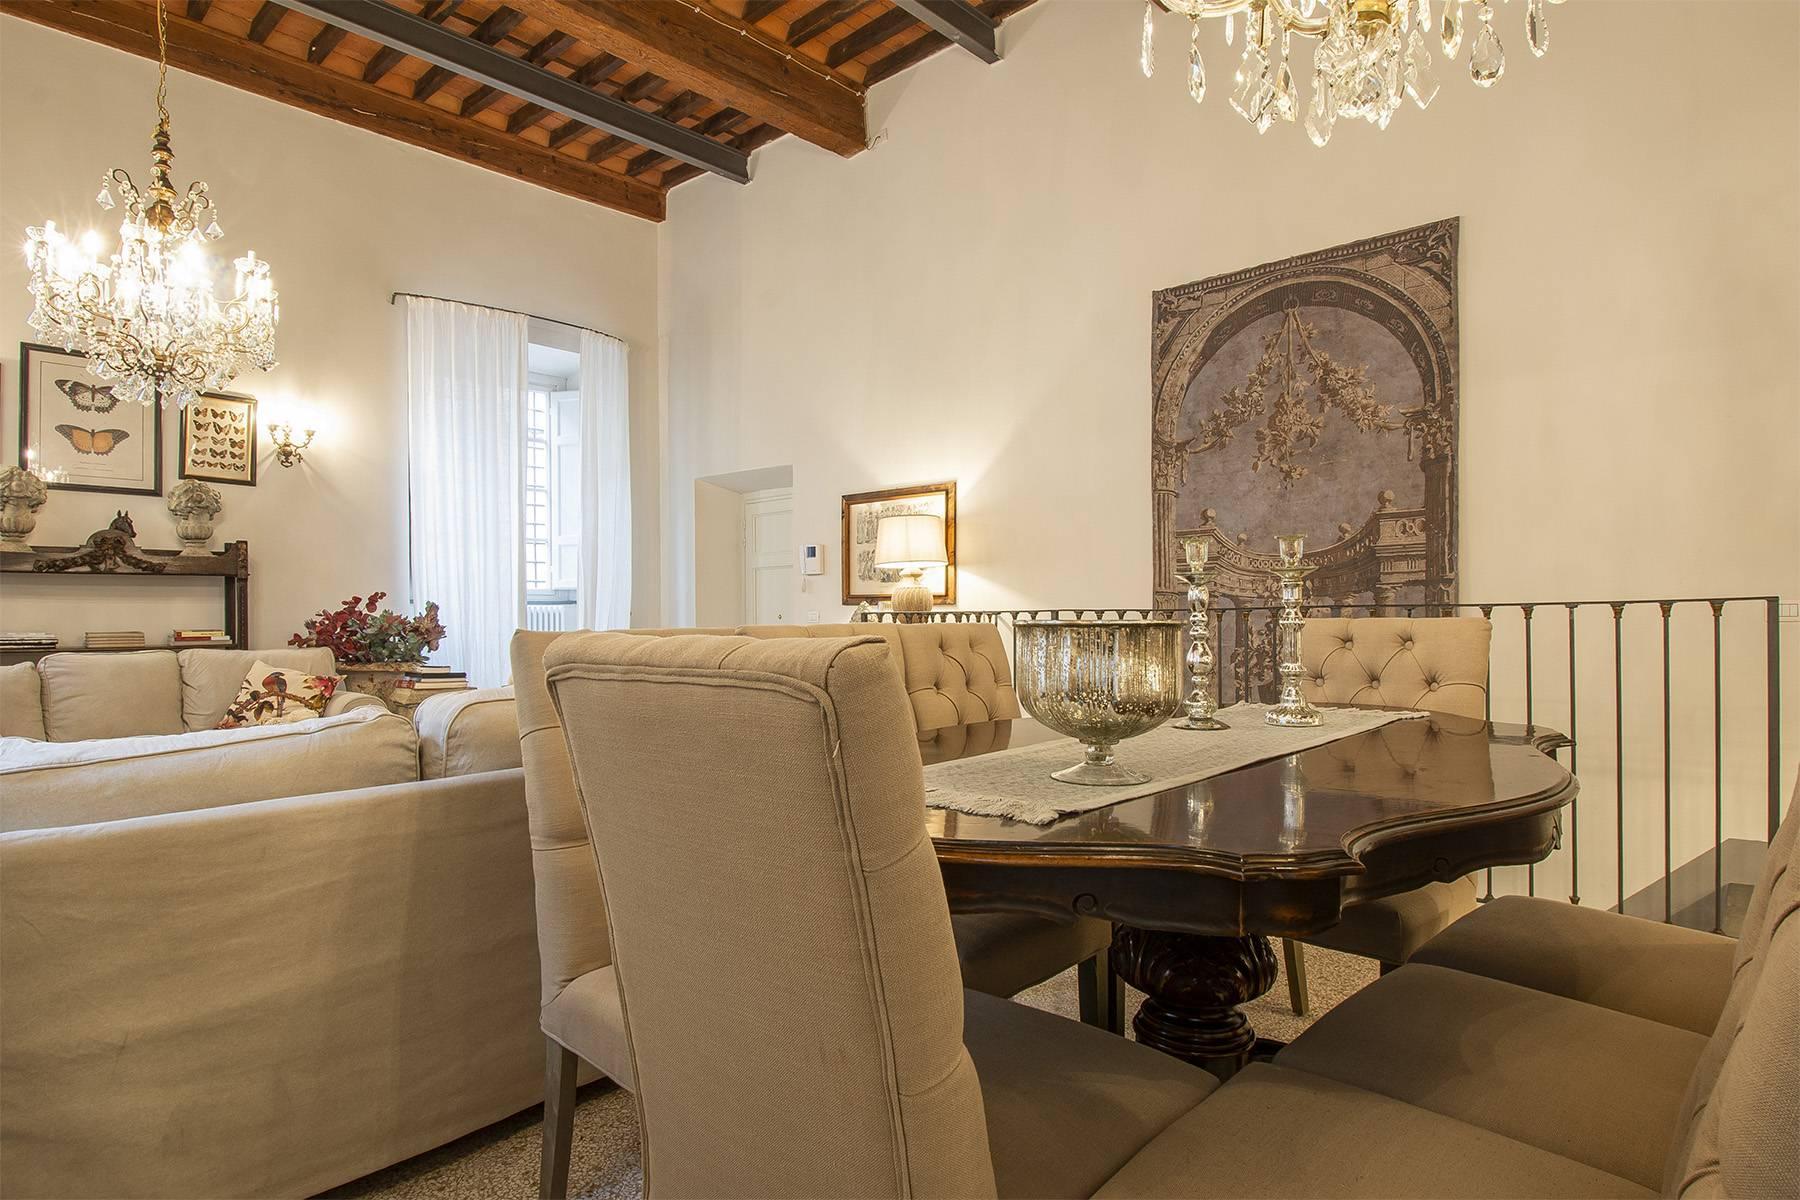 Appartement exclusif au coeur de Lucca - 14